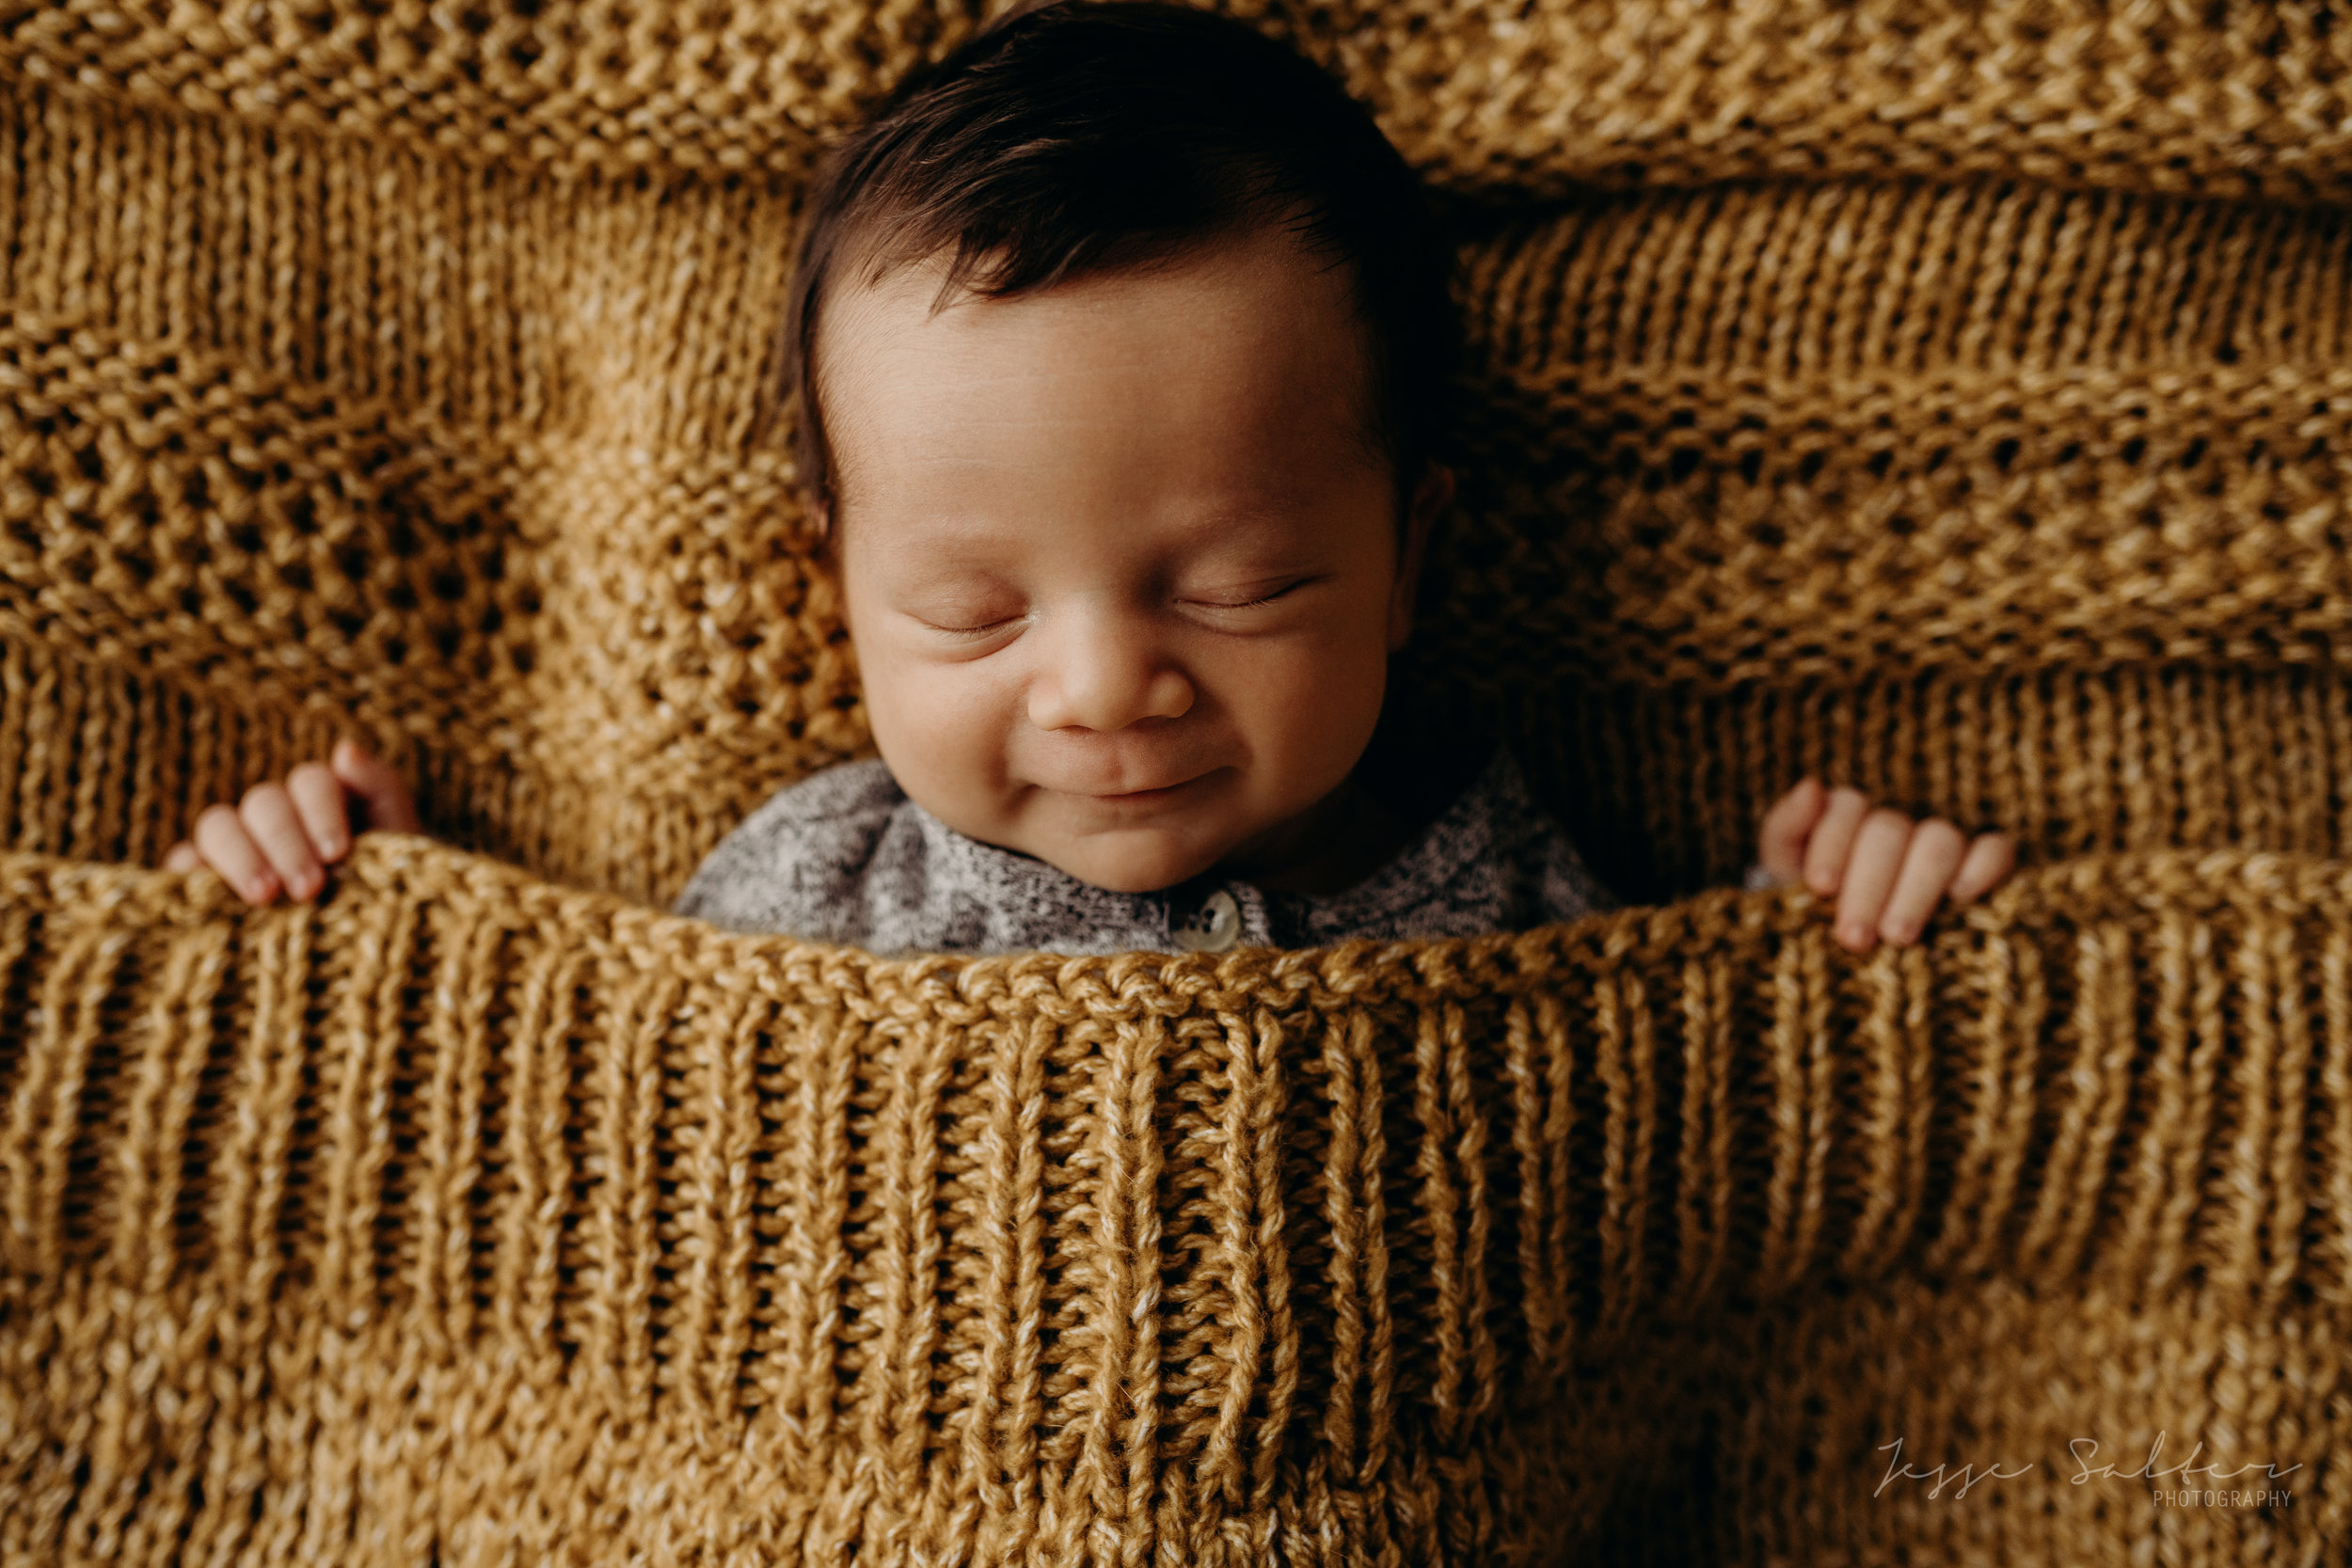 Wylon-Studio-Newborn-Jesse-Salter-Photography-8 copy.jpg